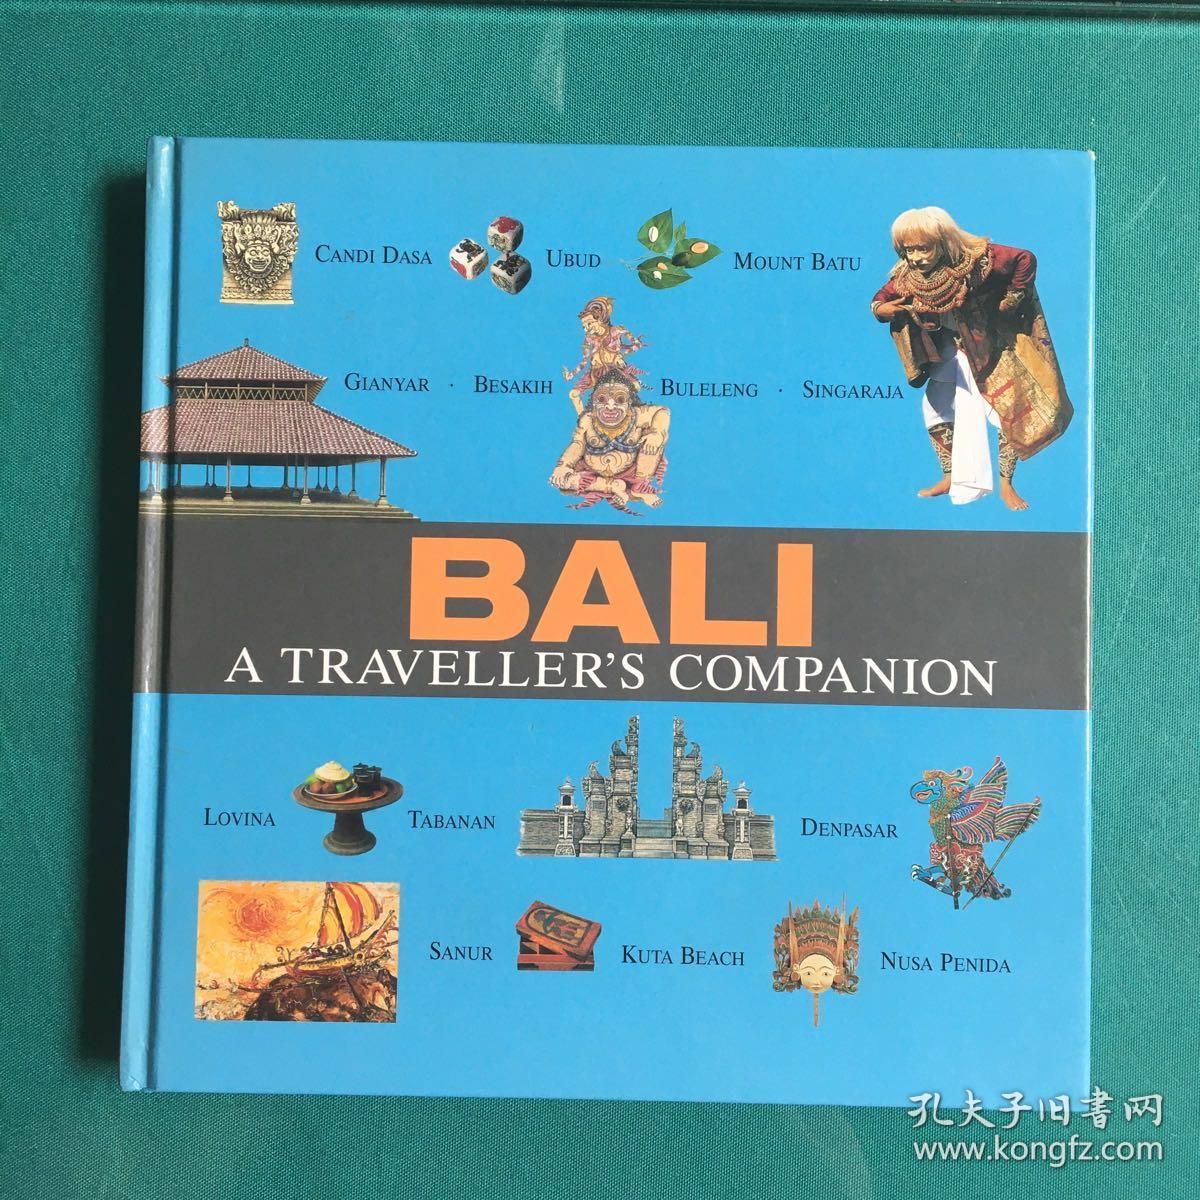 Bali a Traveller's Companion巴厘岛旅行者的伴侣